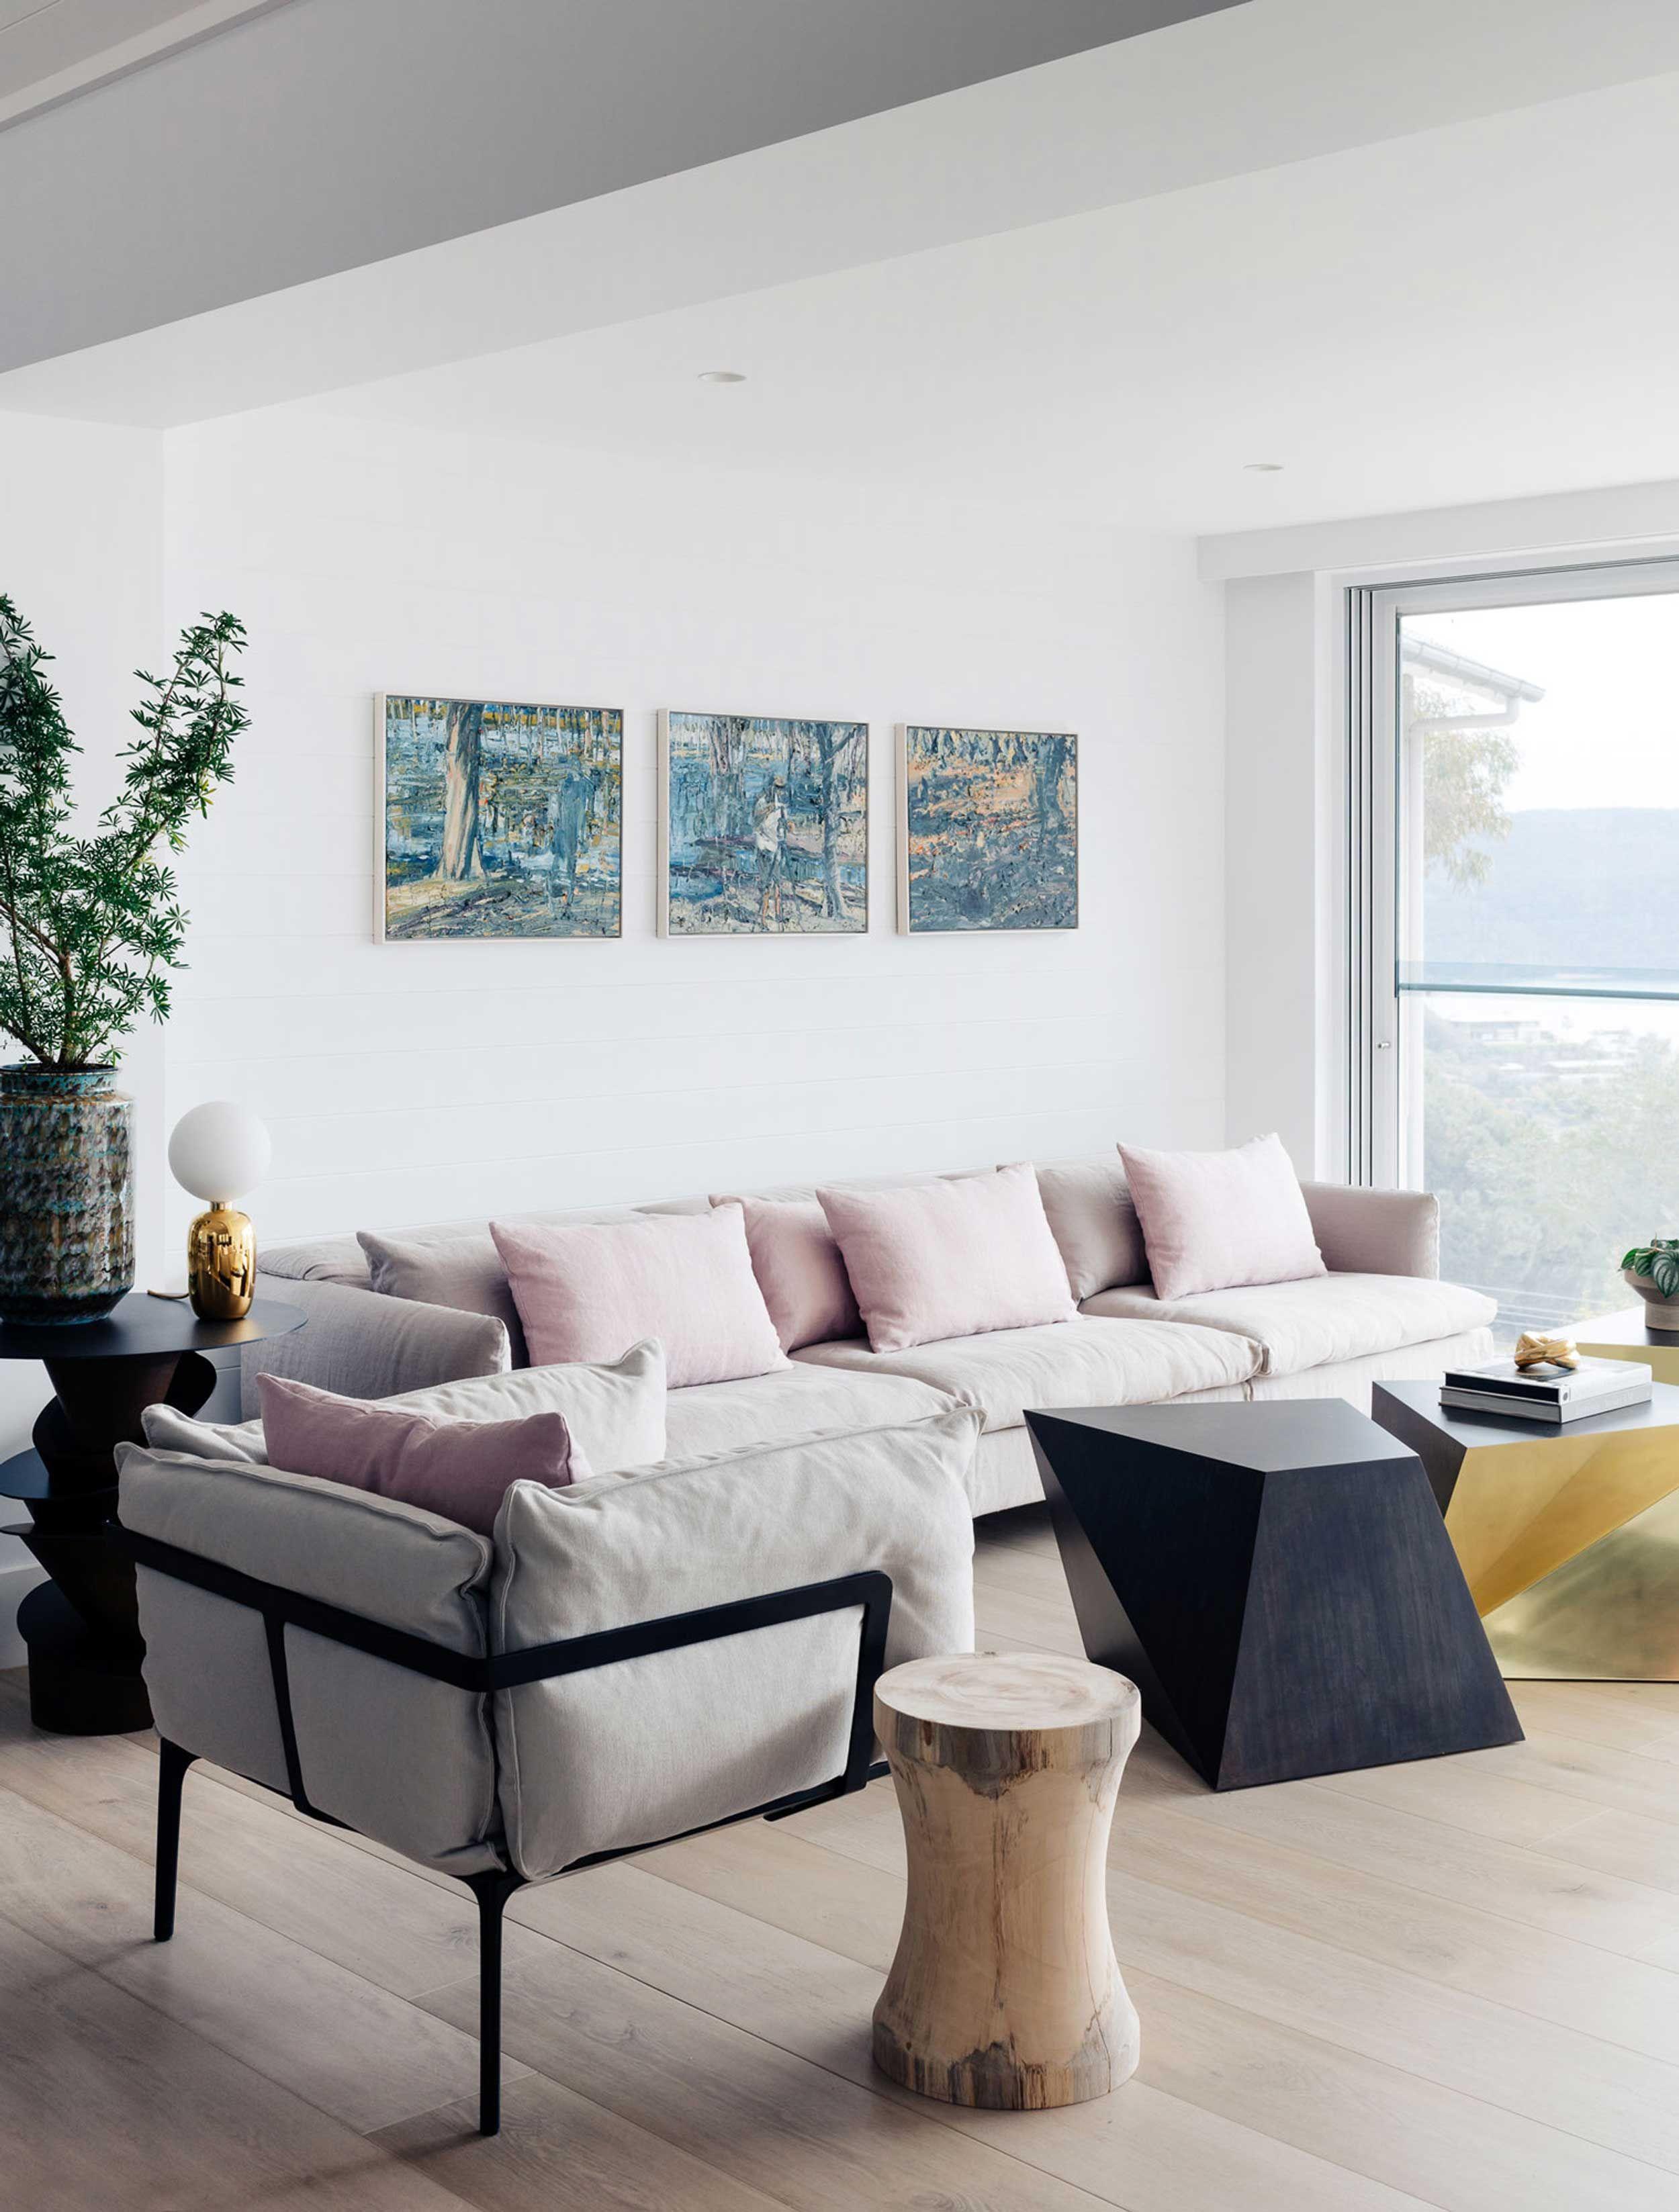 gallery furniture inspiration room decor australian interior rh pinterest co uk